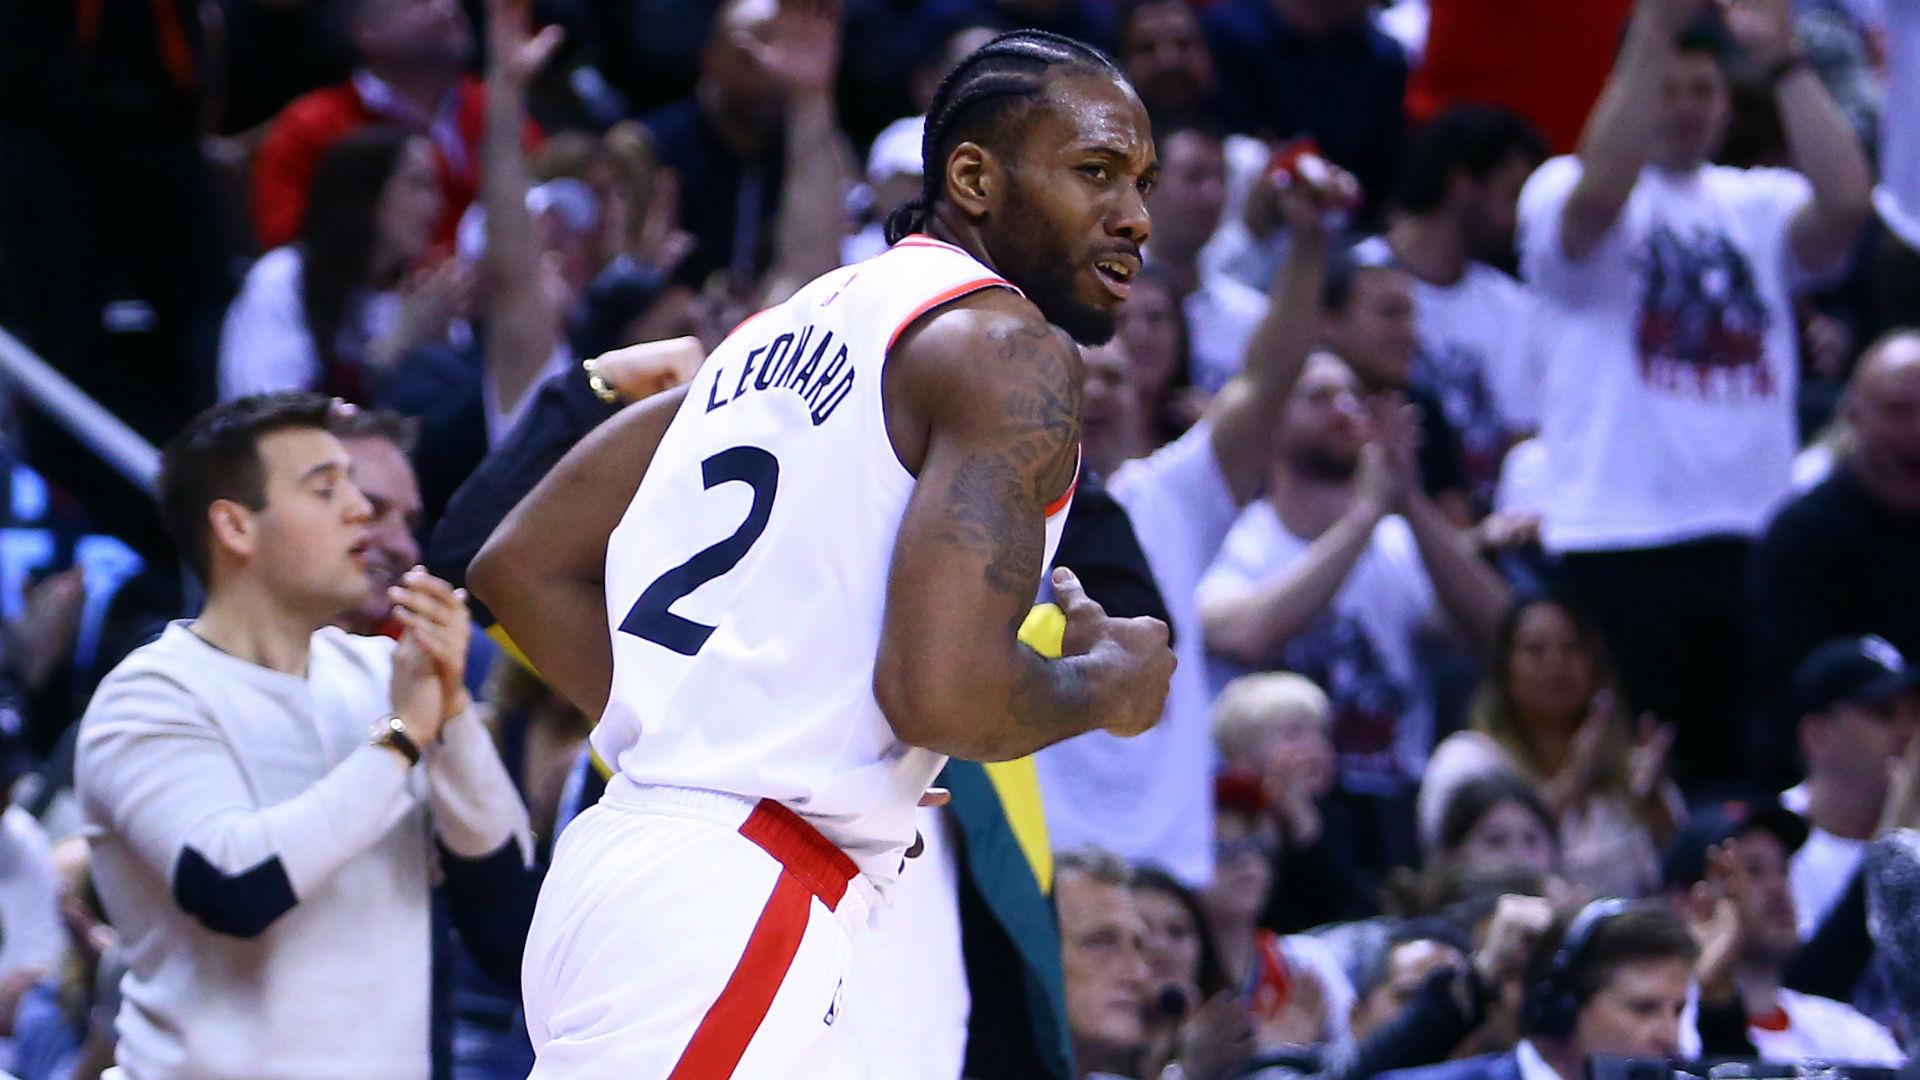 NBA playoffs 2019: Raptors' Nick Nurse praises Kawhi Leonard's 'big-time' performance